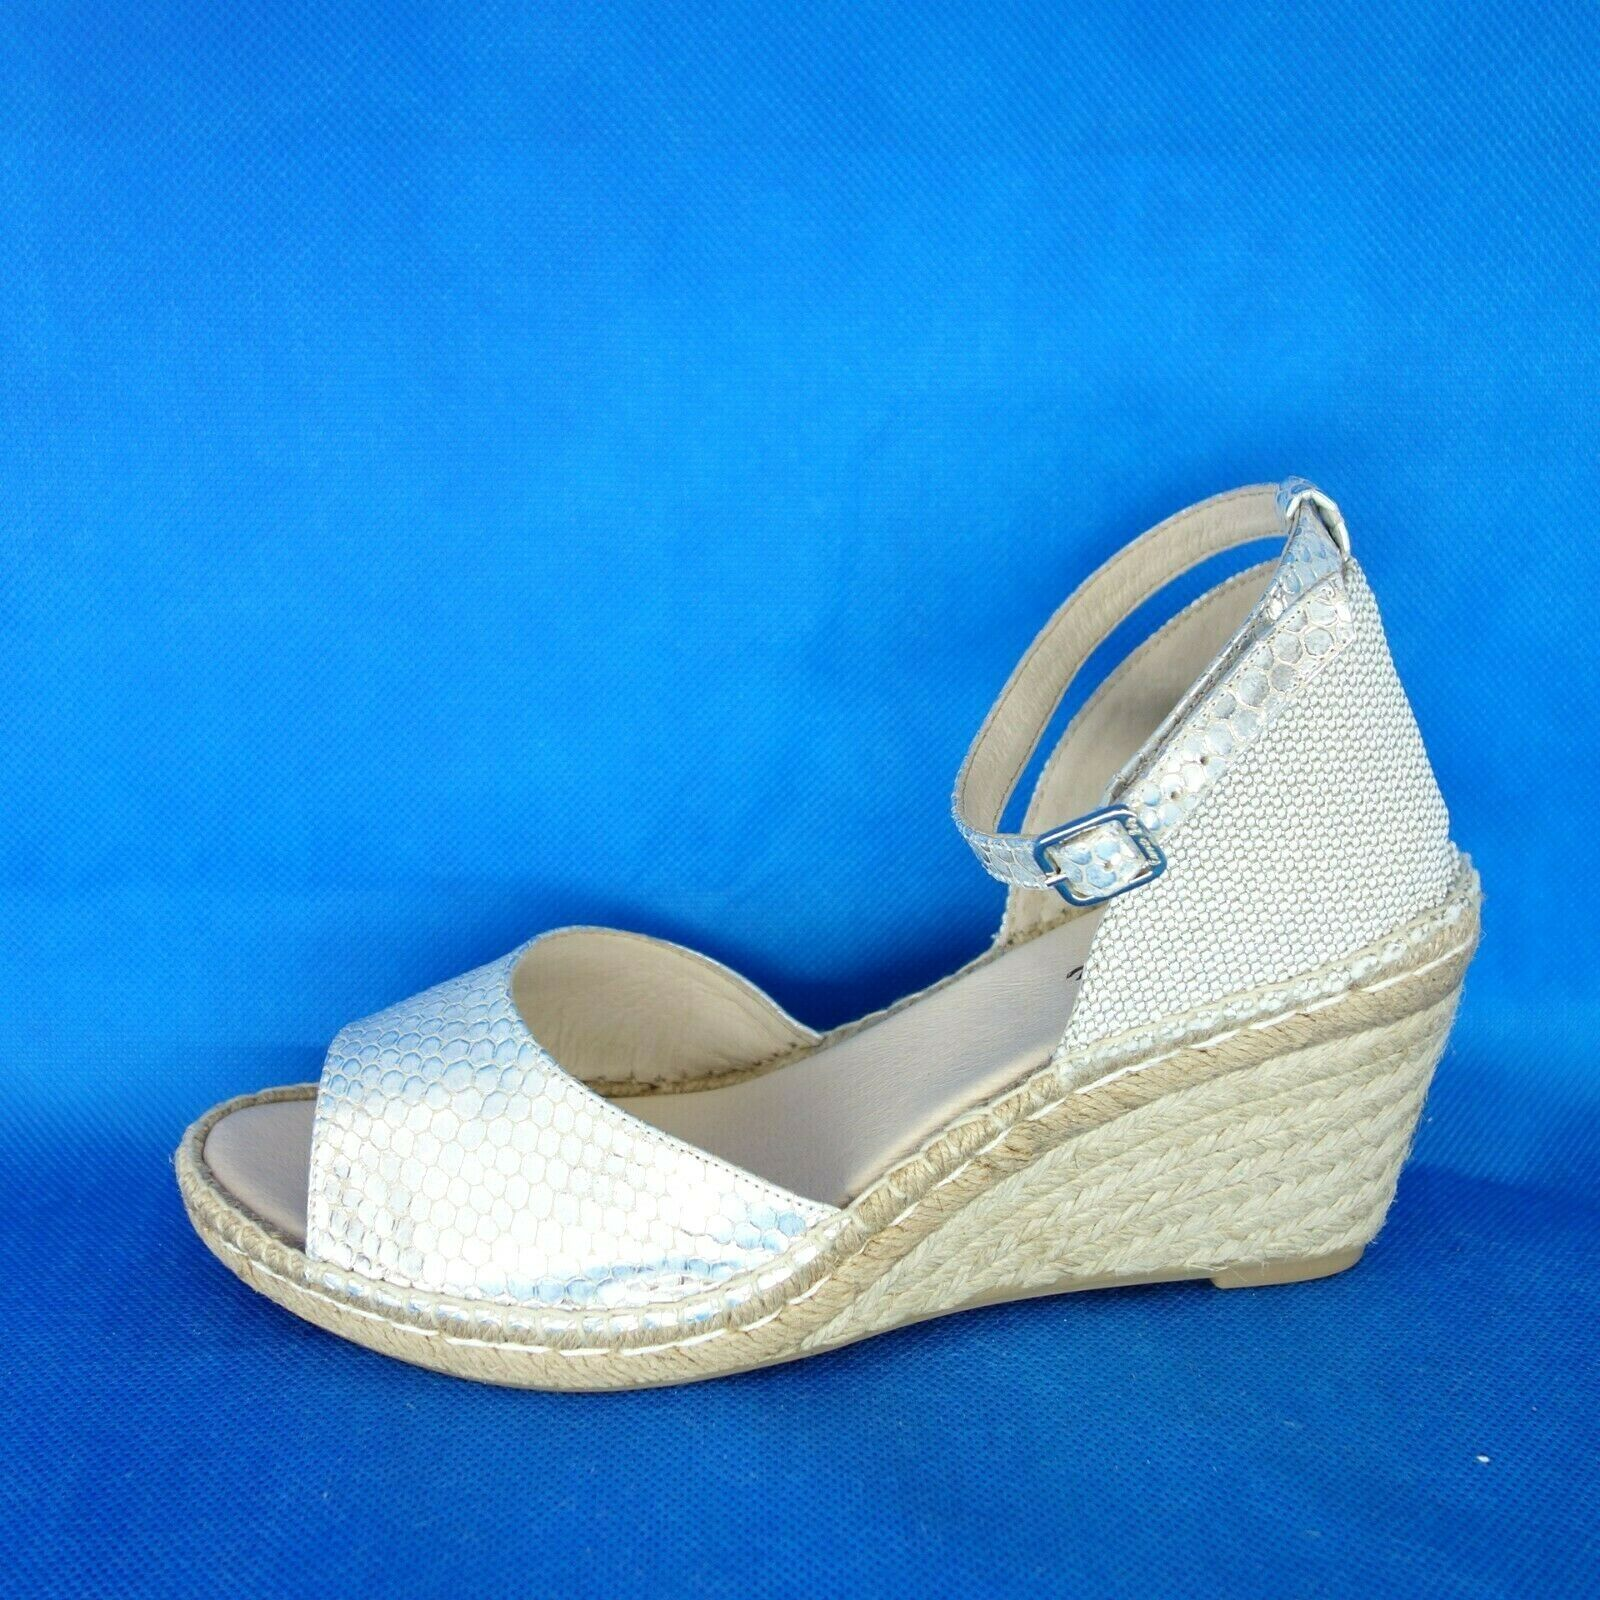 Carmen Saiz Ladies Espadrilles Sandals Wedge Greco silver 37 41 Leather Np 99 New